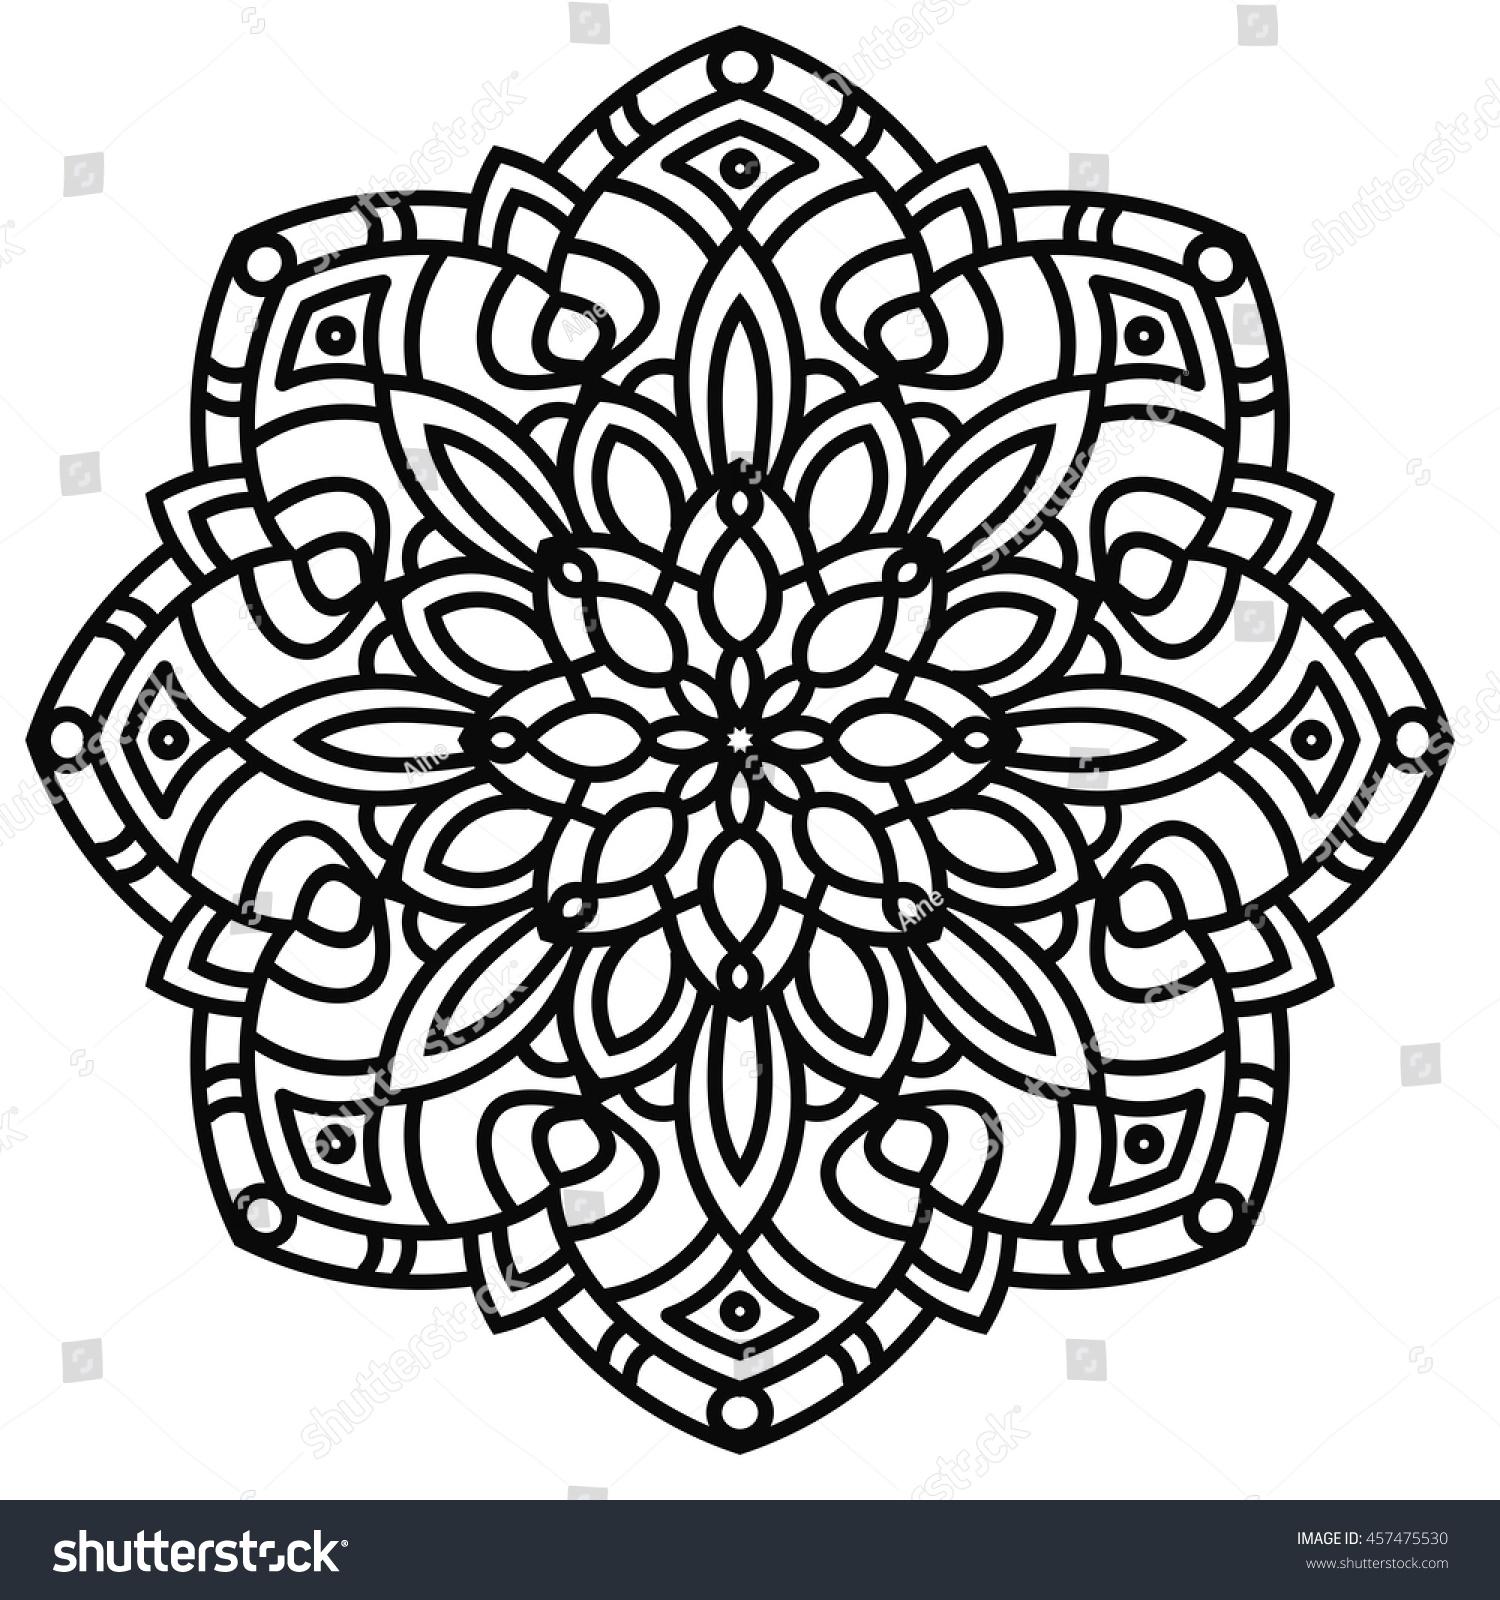 Royalty Free Ethnic Floral Mandala Orient 457475530 Stock Photo